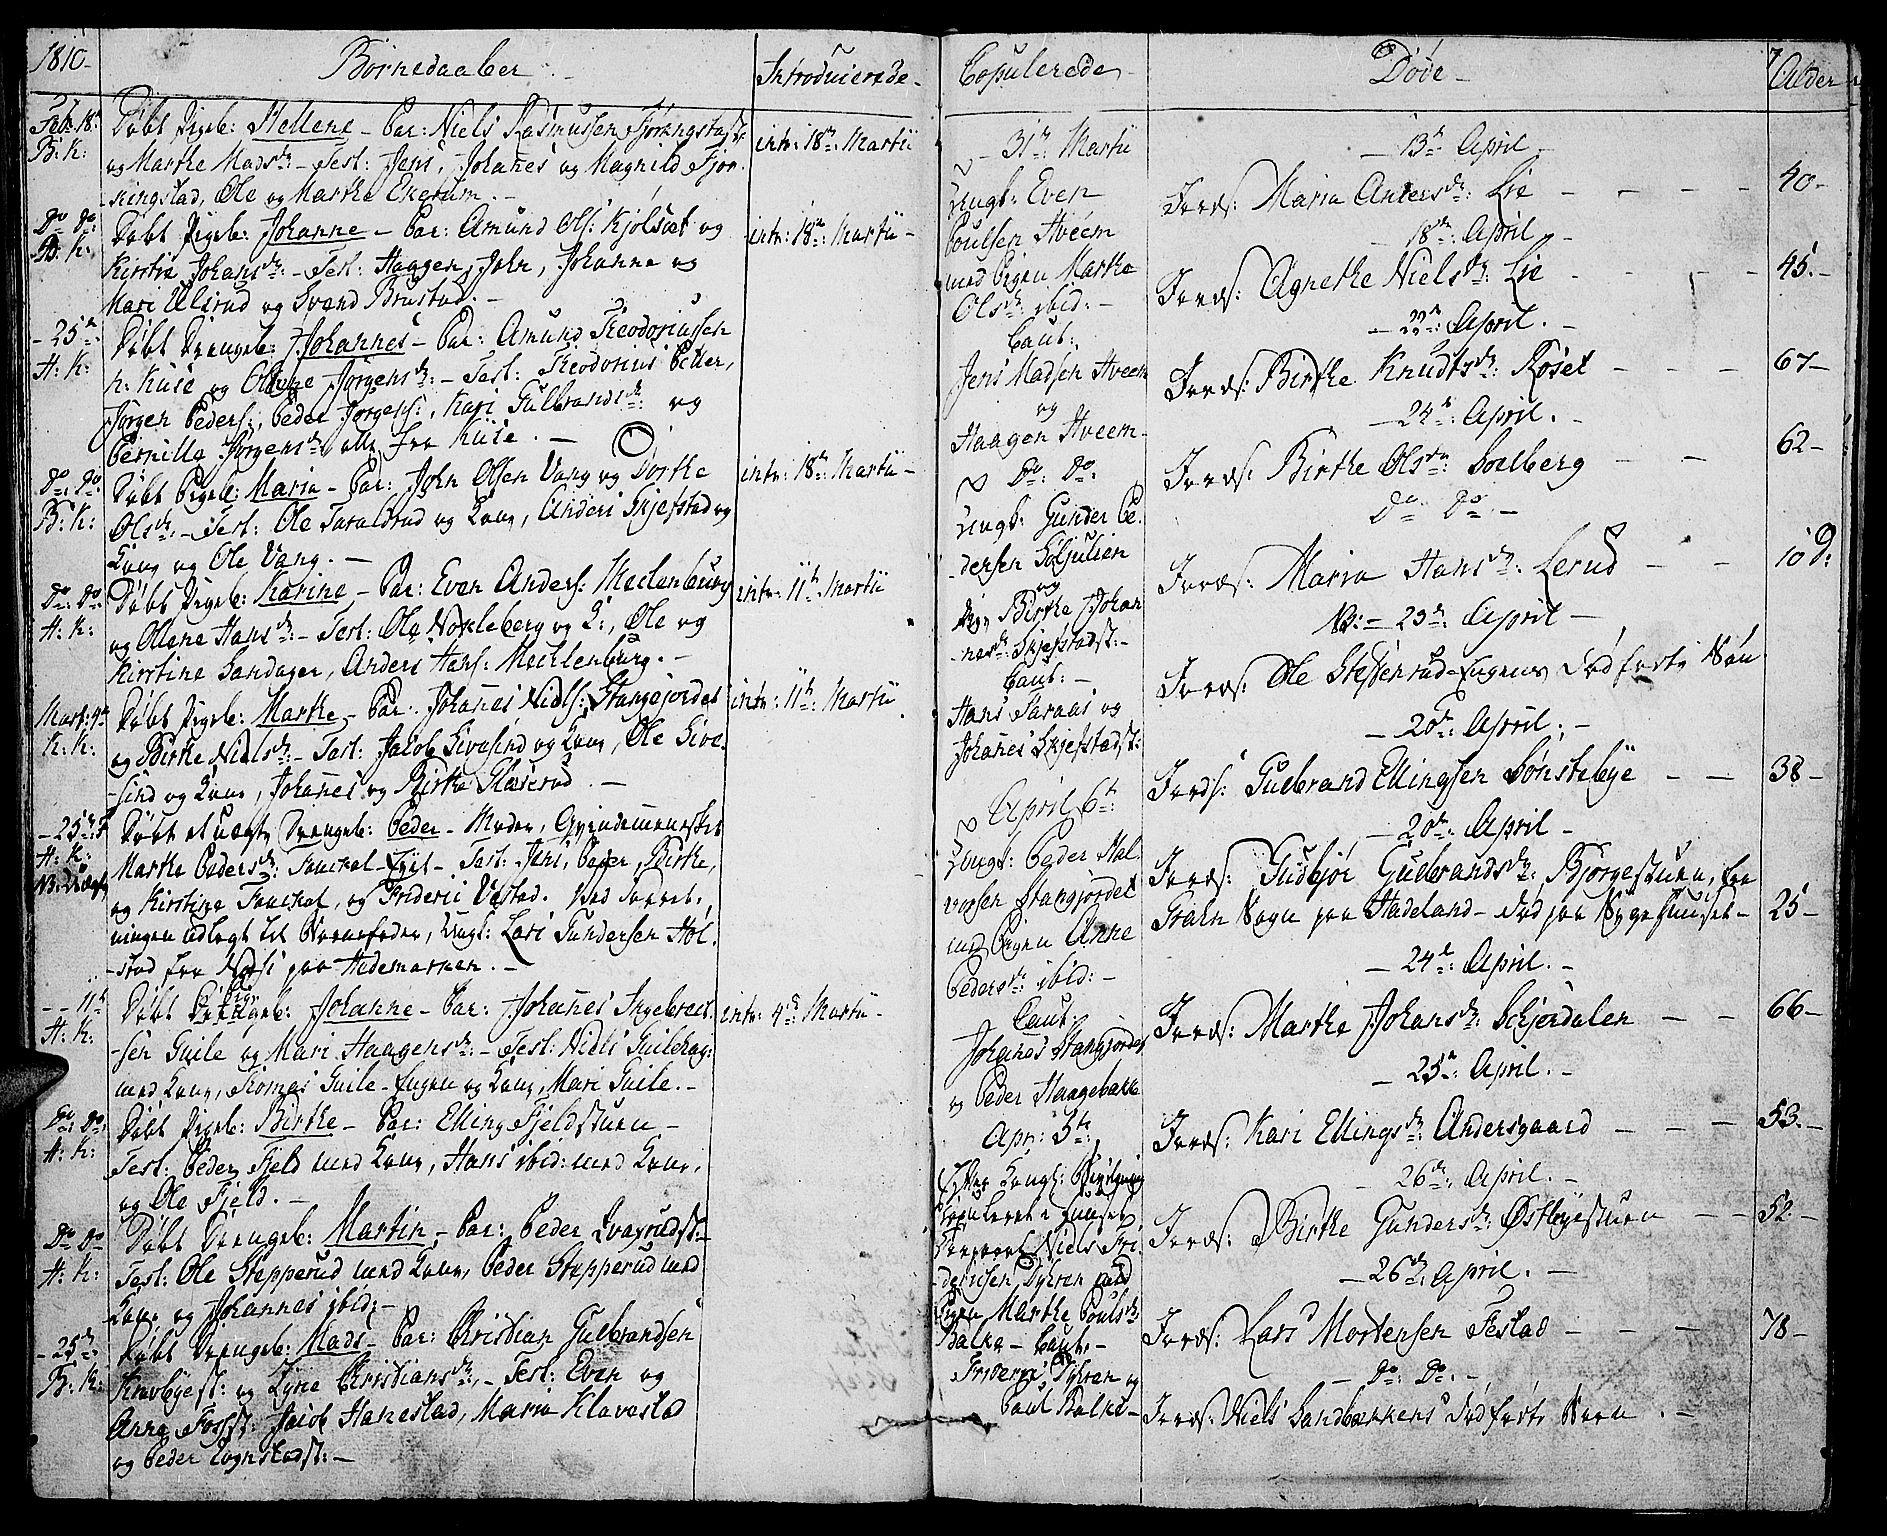 SAH, Toten prestekontor, Ministerialbok nr. 8, 1809-1814, s. 7